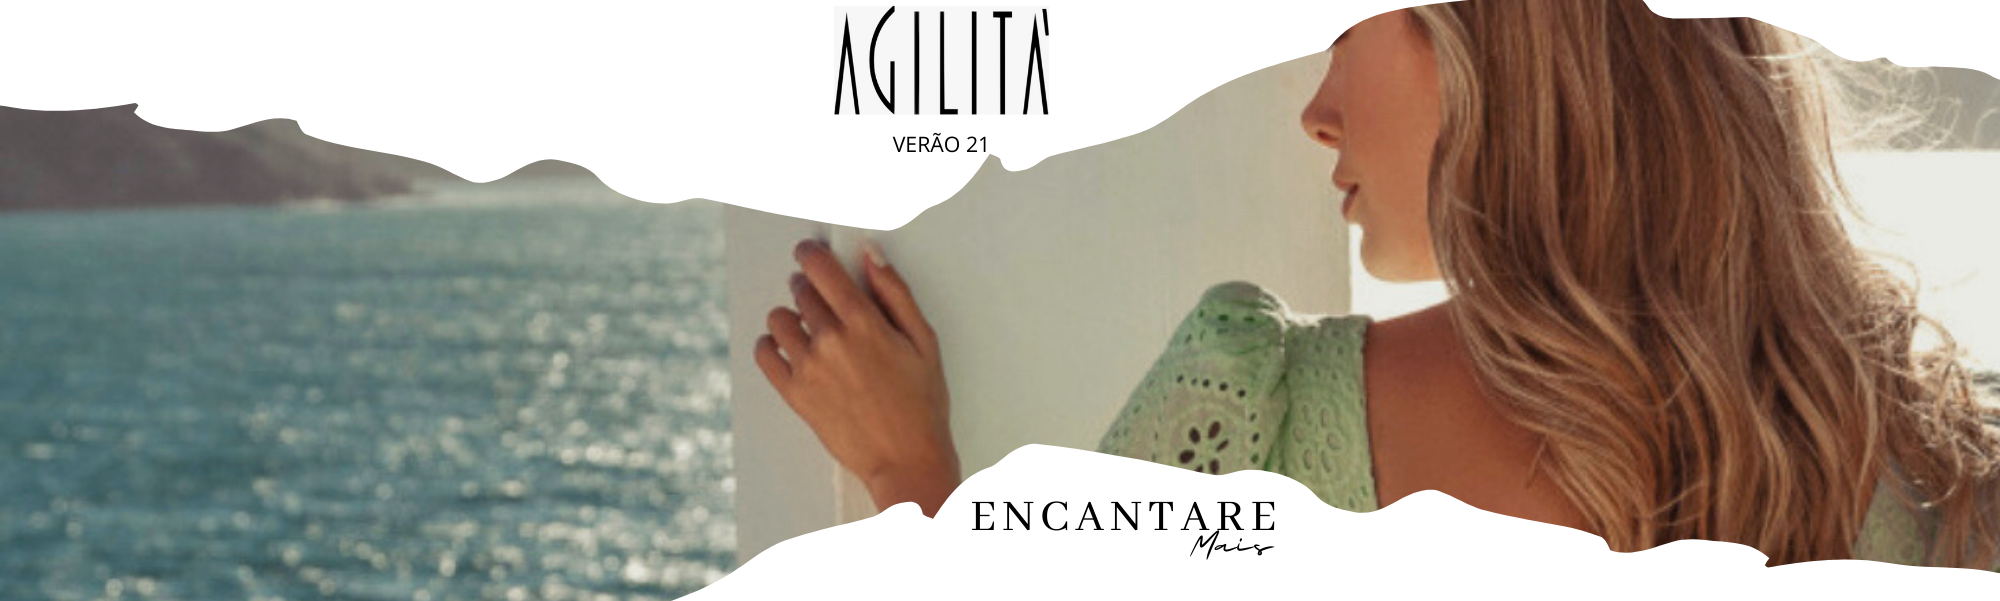 #Agilita